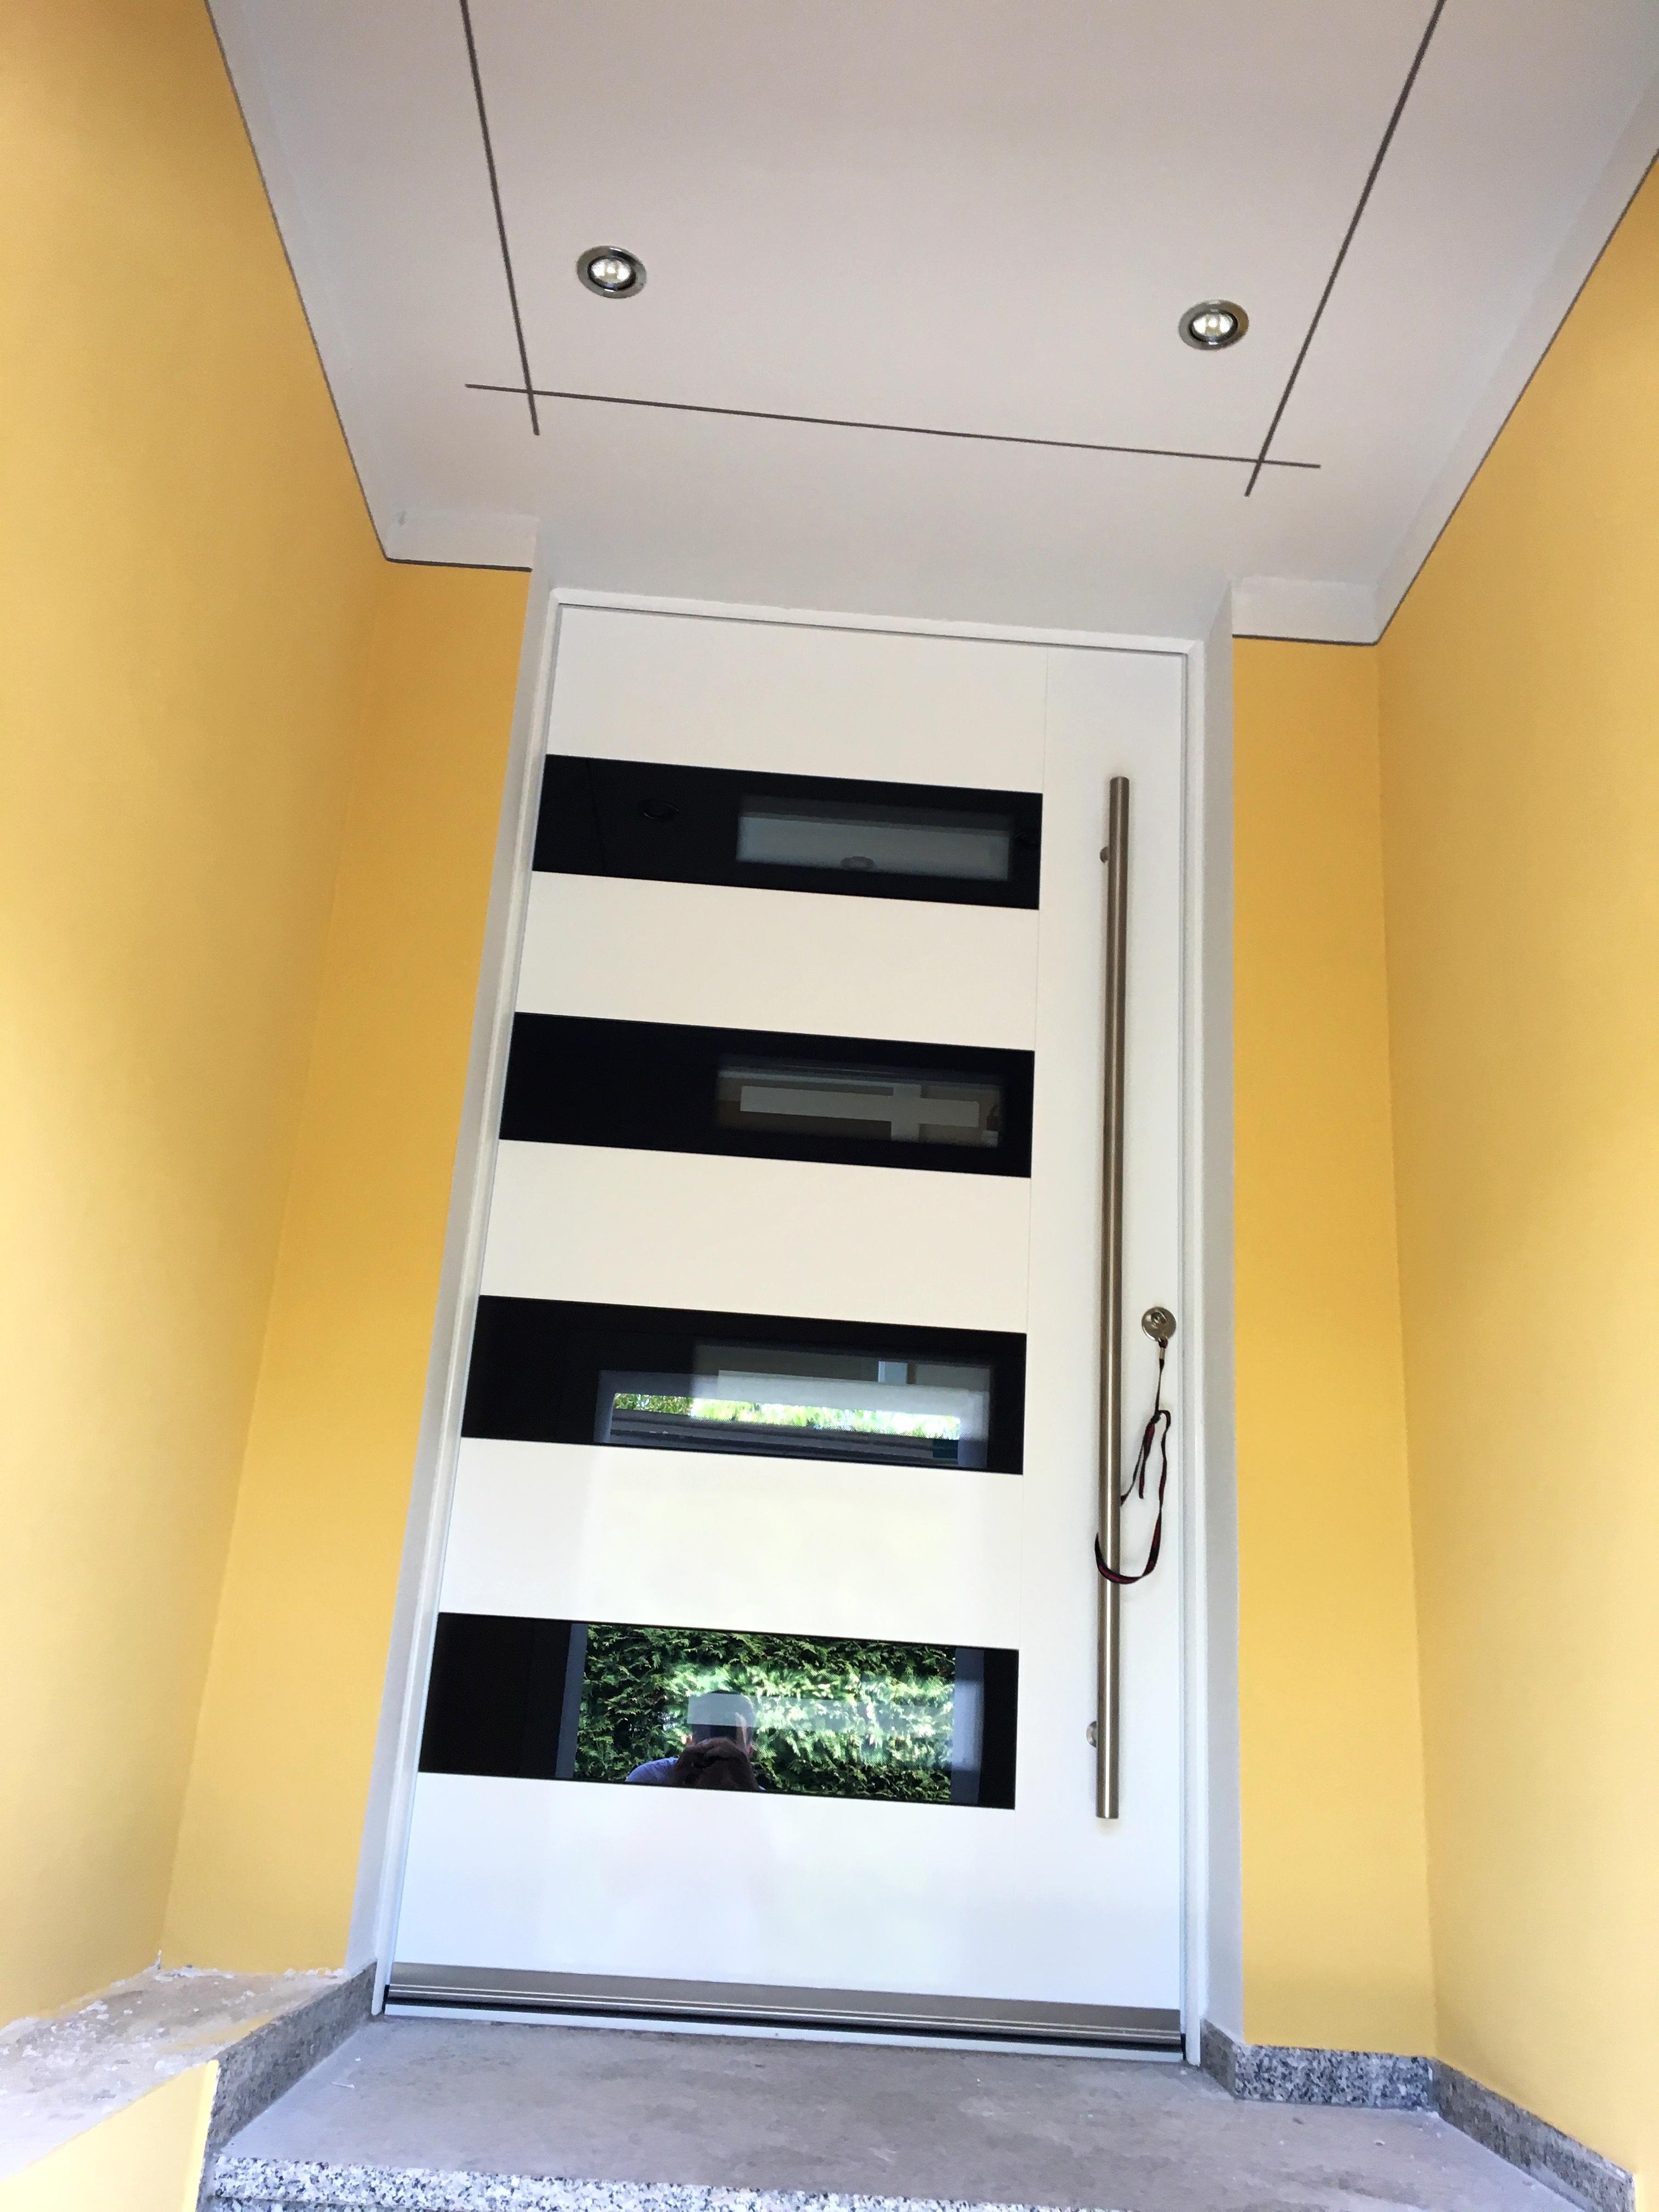 Fassadengestaltung steinoptik  Sonniges Wetter=Fassadenwetter | Malermeister Martin Eifert